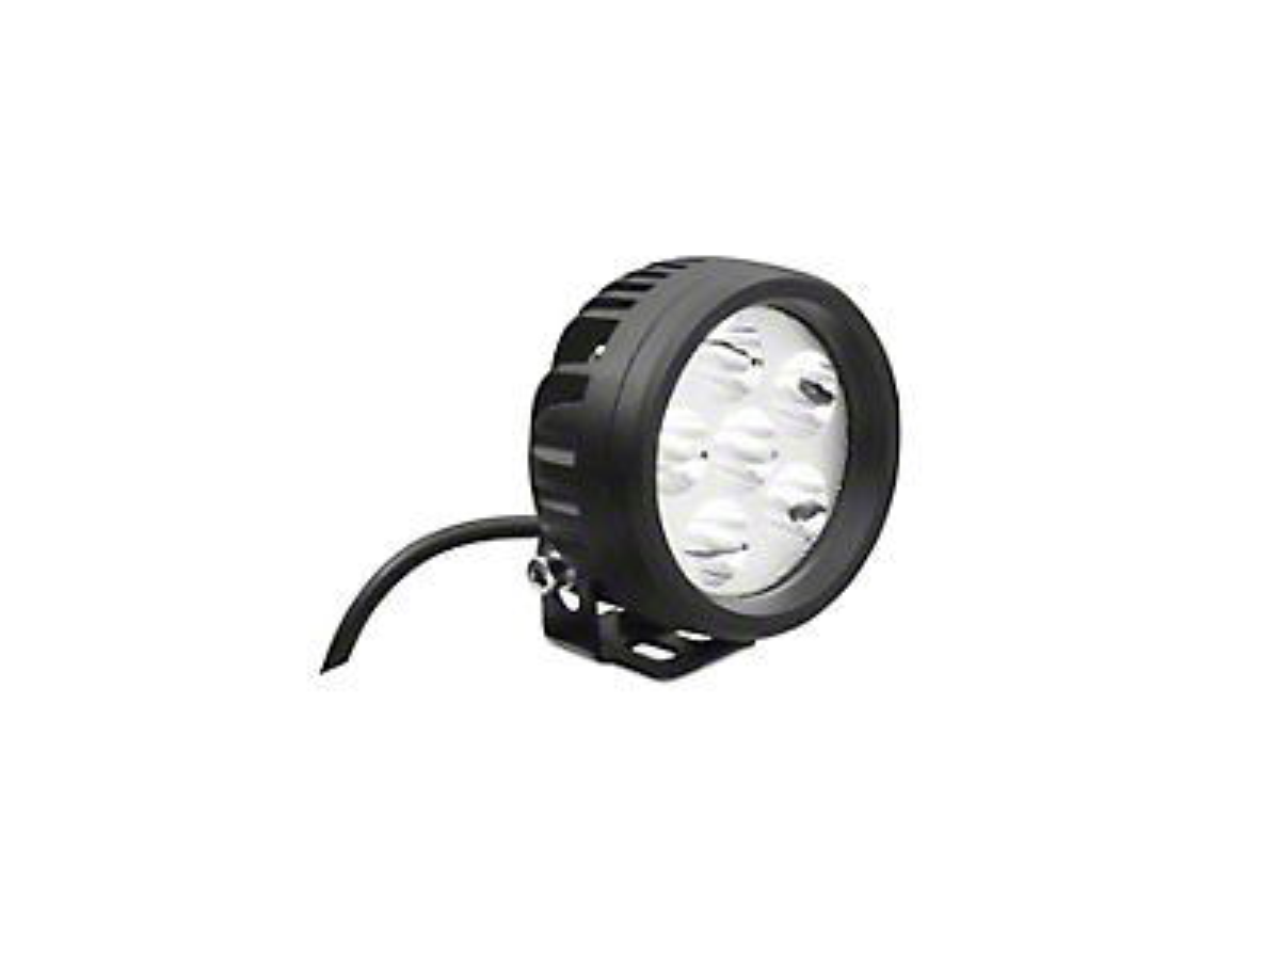 DV8 Off-Road 3.5 in. Round LED Light - Spot Beam (87-18 Wrangler YJ, TJ, JK & JL)